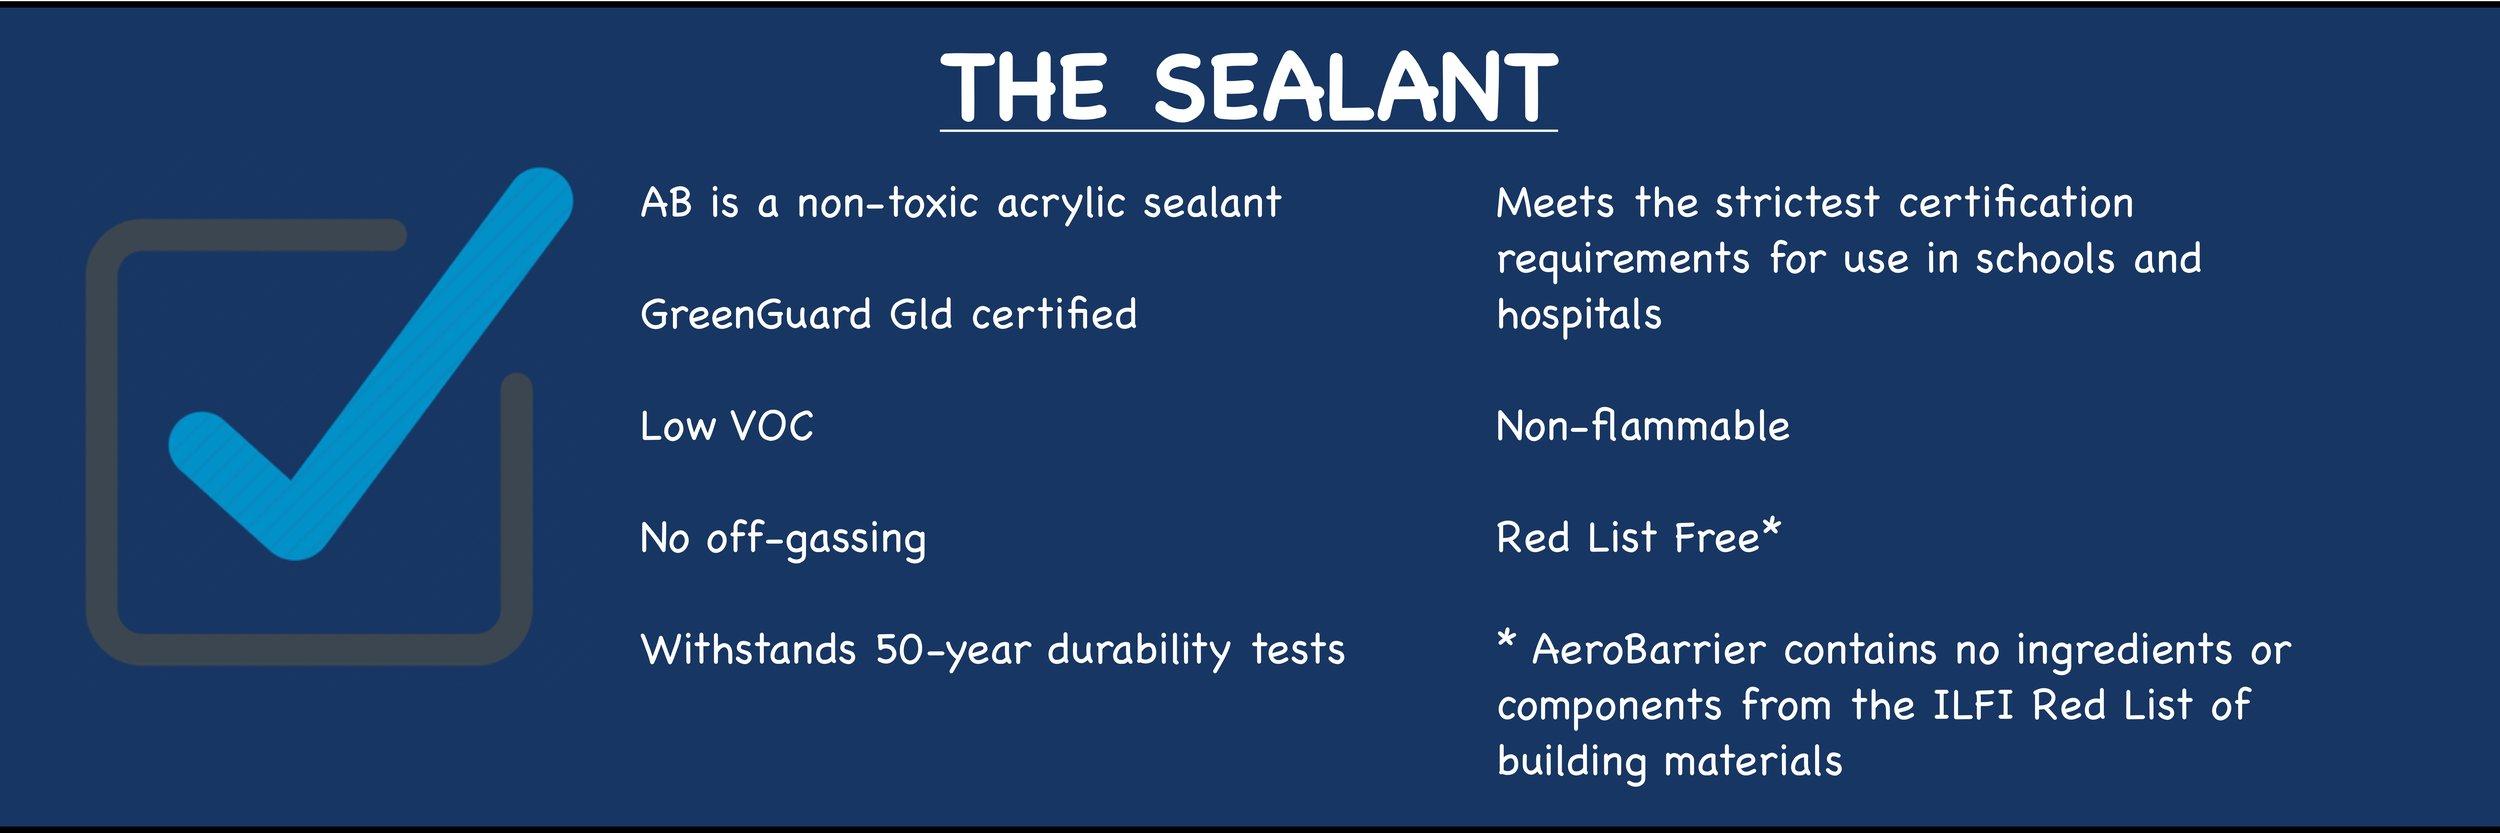 The Sealant.jpg